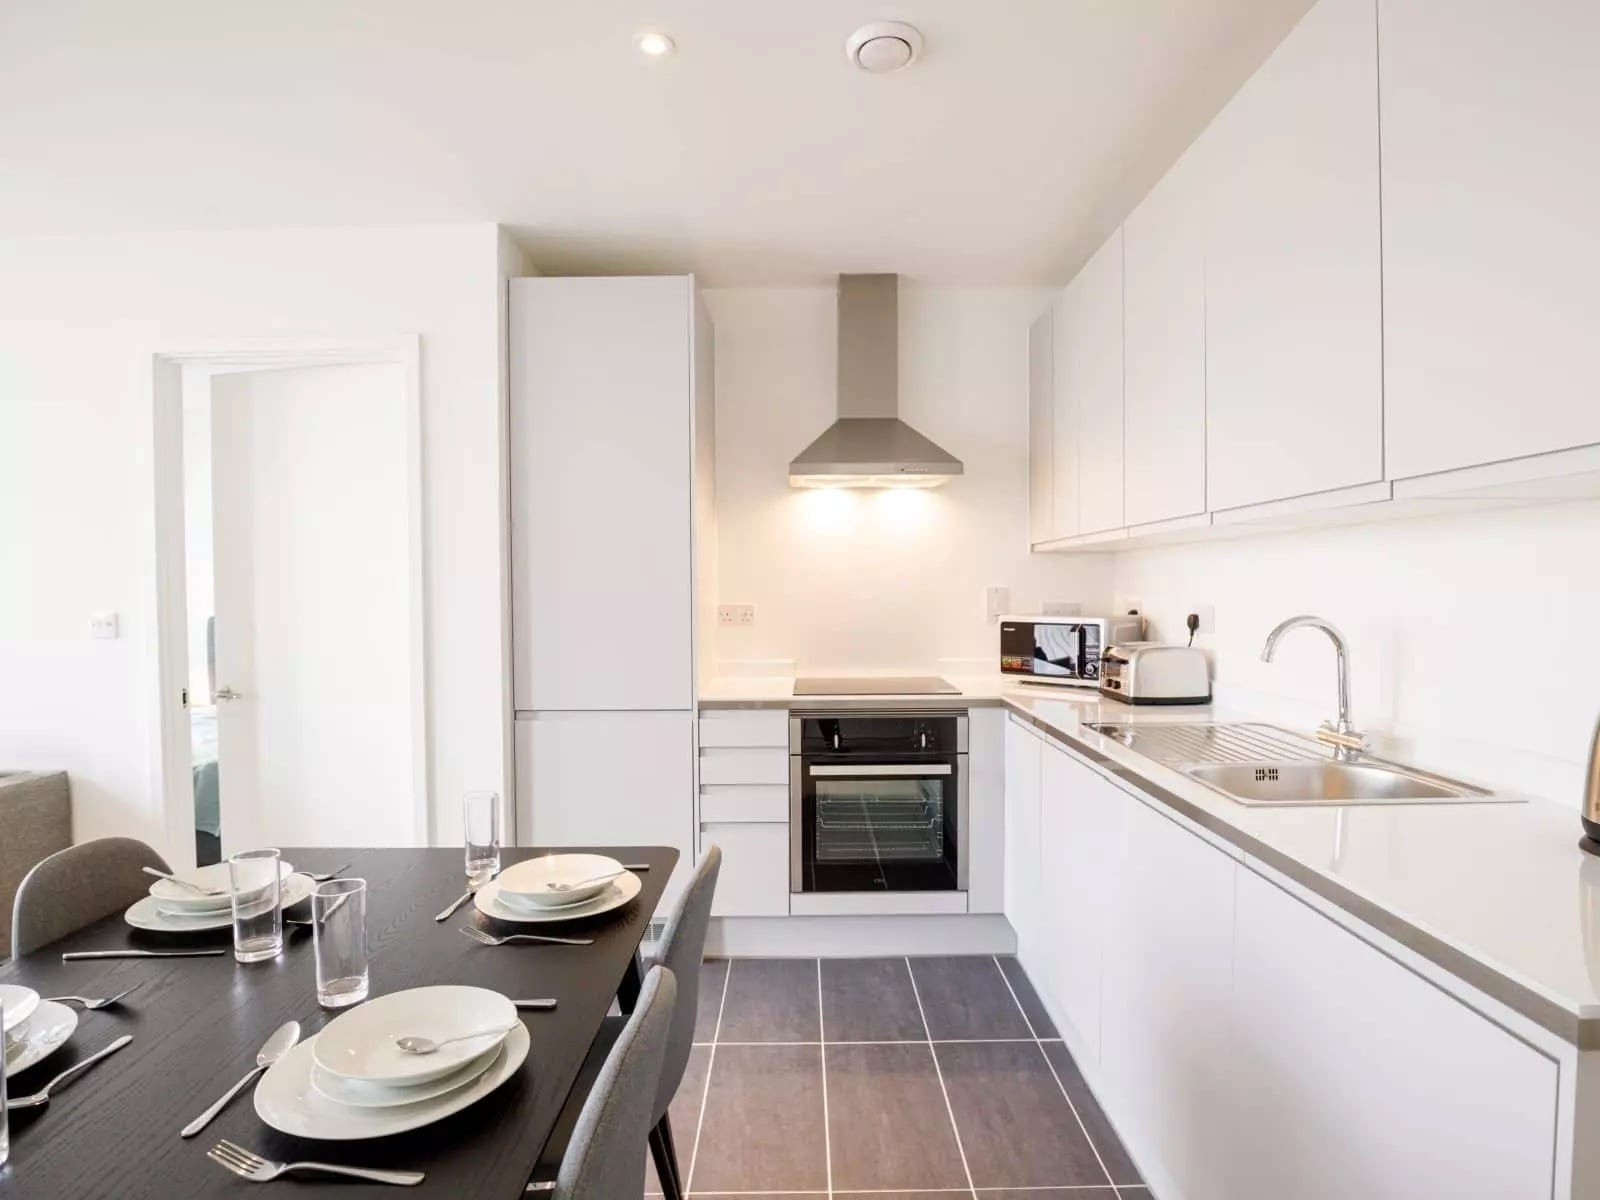 burlington-square-apartment-kitchen